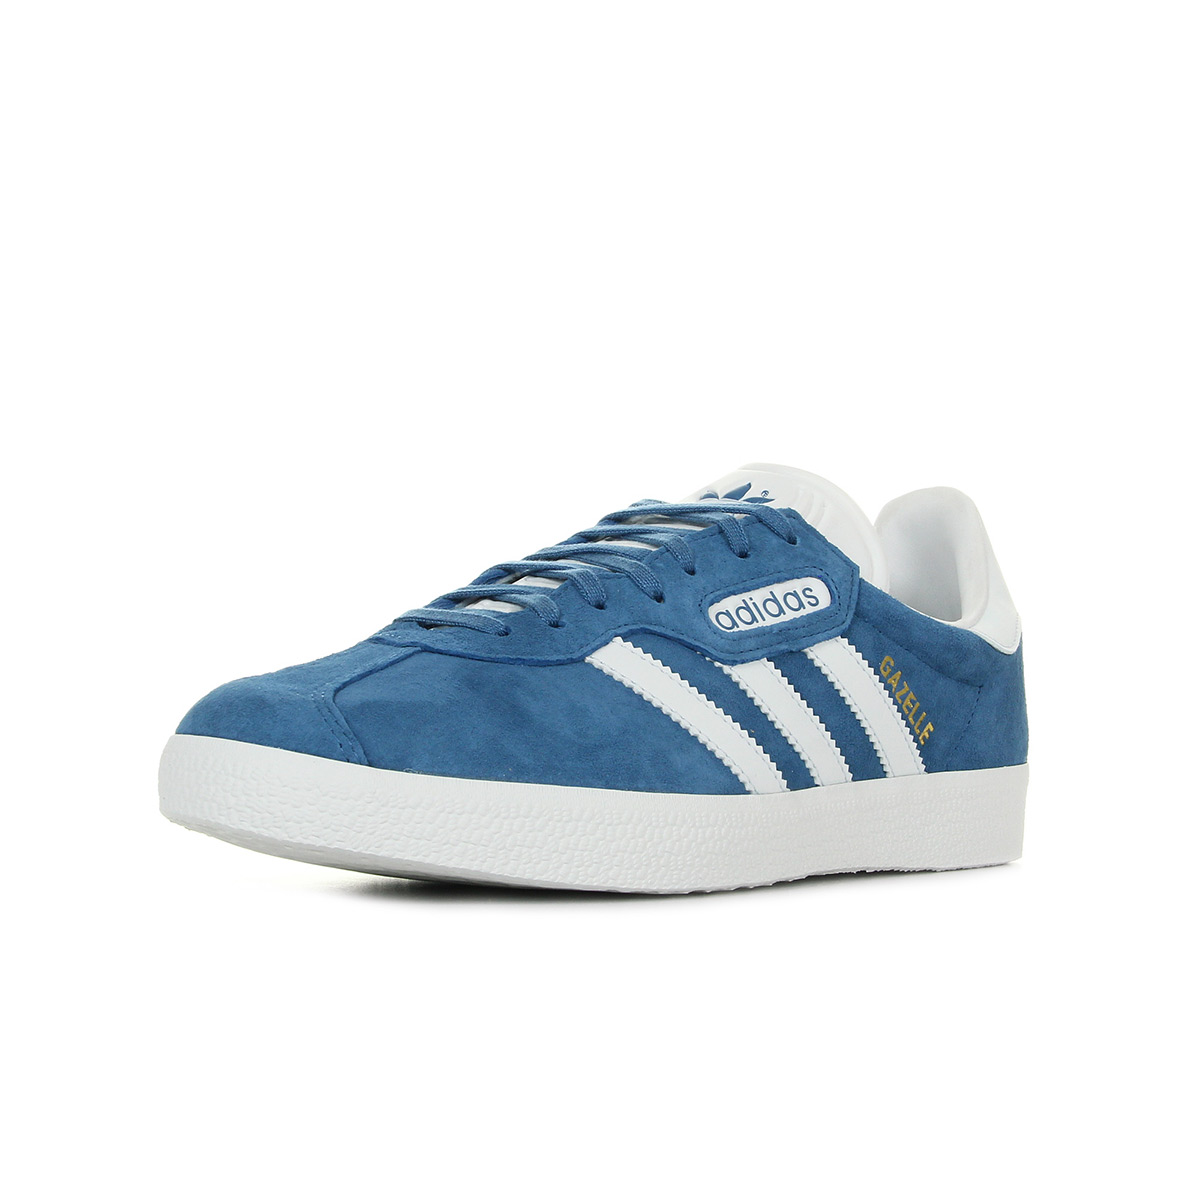 Chaussures Baskets adidas unisexe Gazelle Super Essential taille Bleu Bleue Cuir